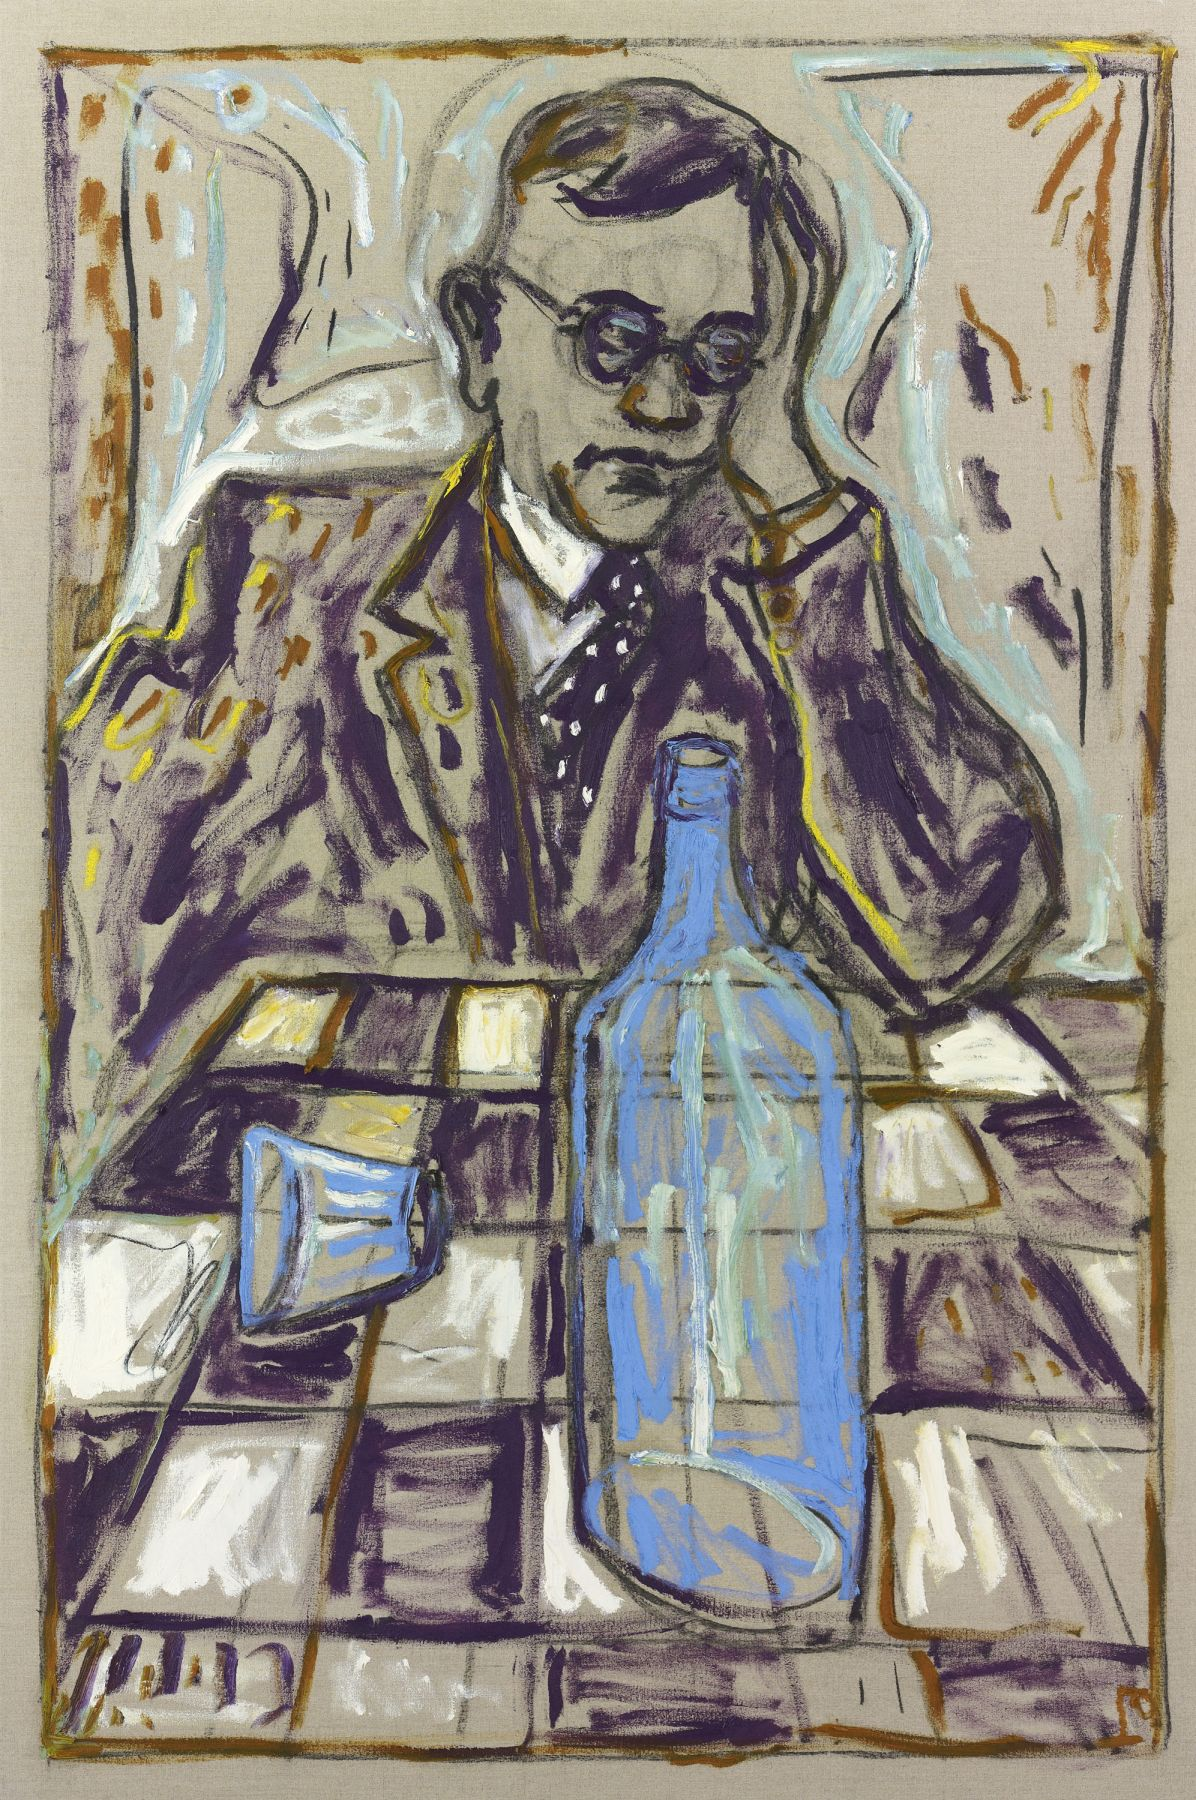 BILLY CHILDISH (Fallada) Man with Blue Bottle, 2010